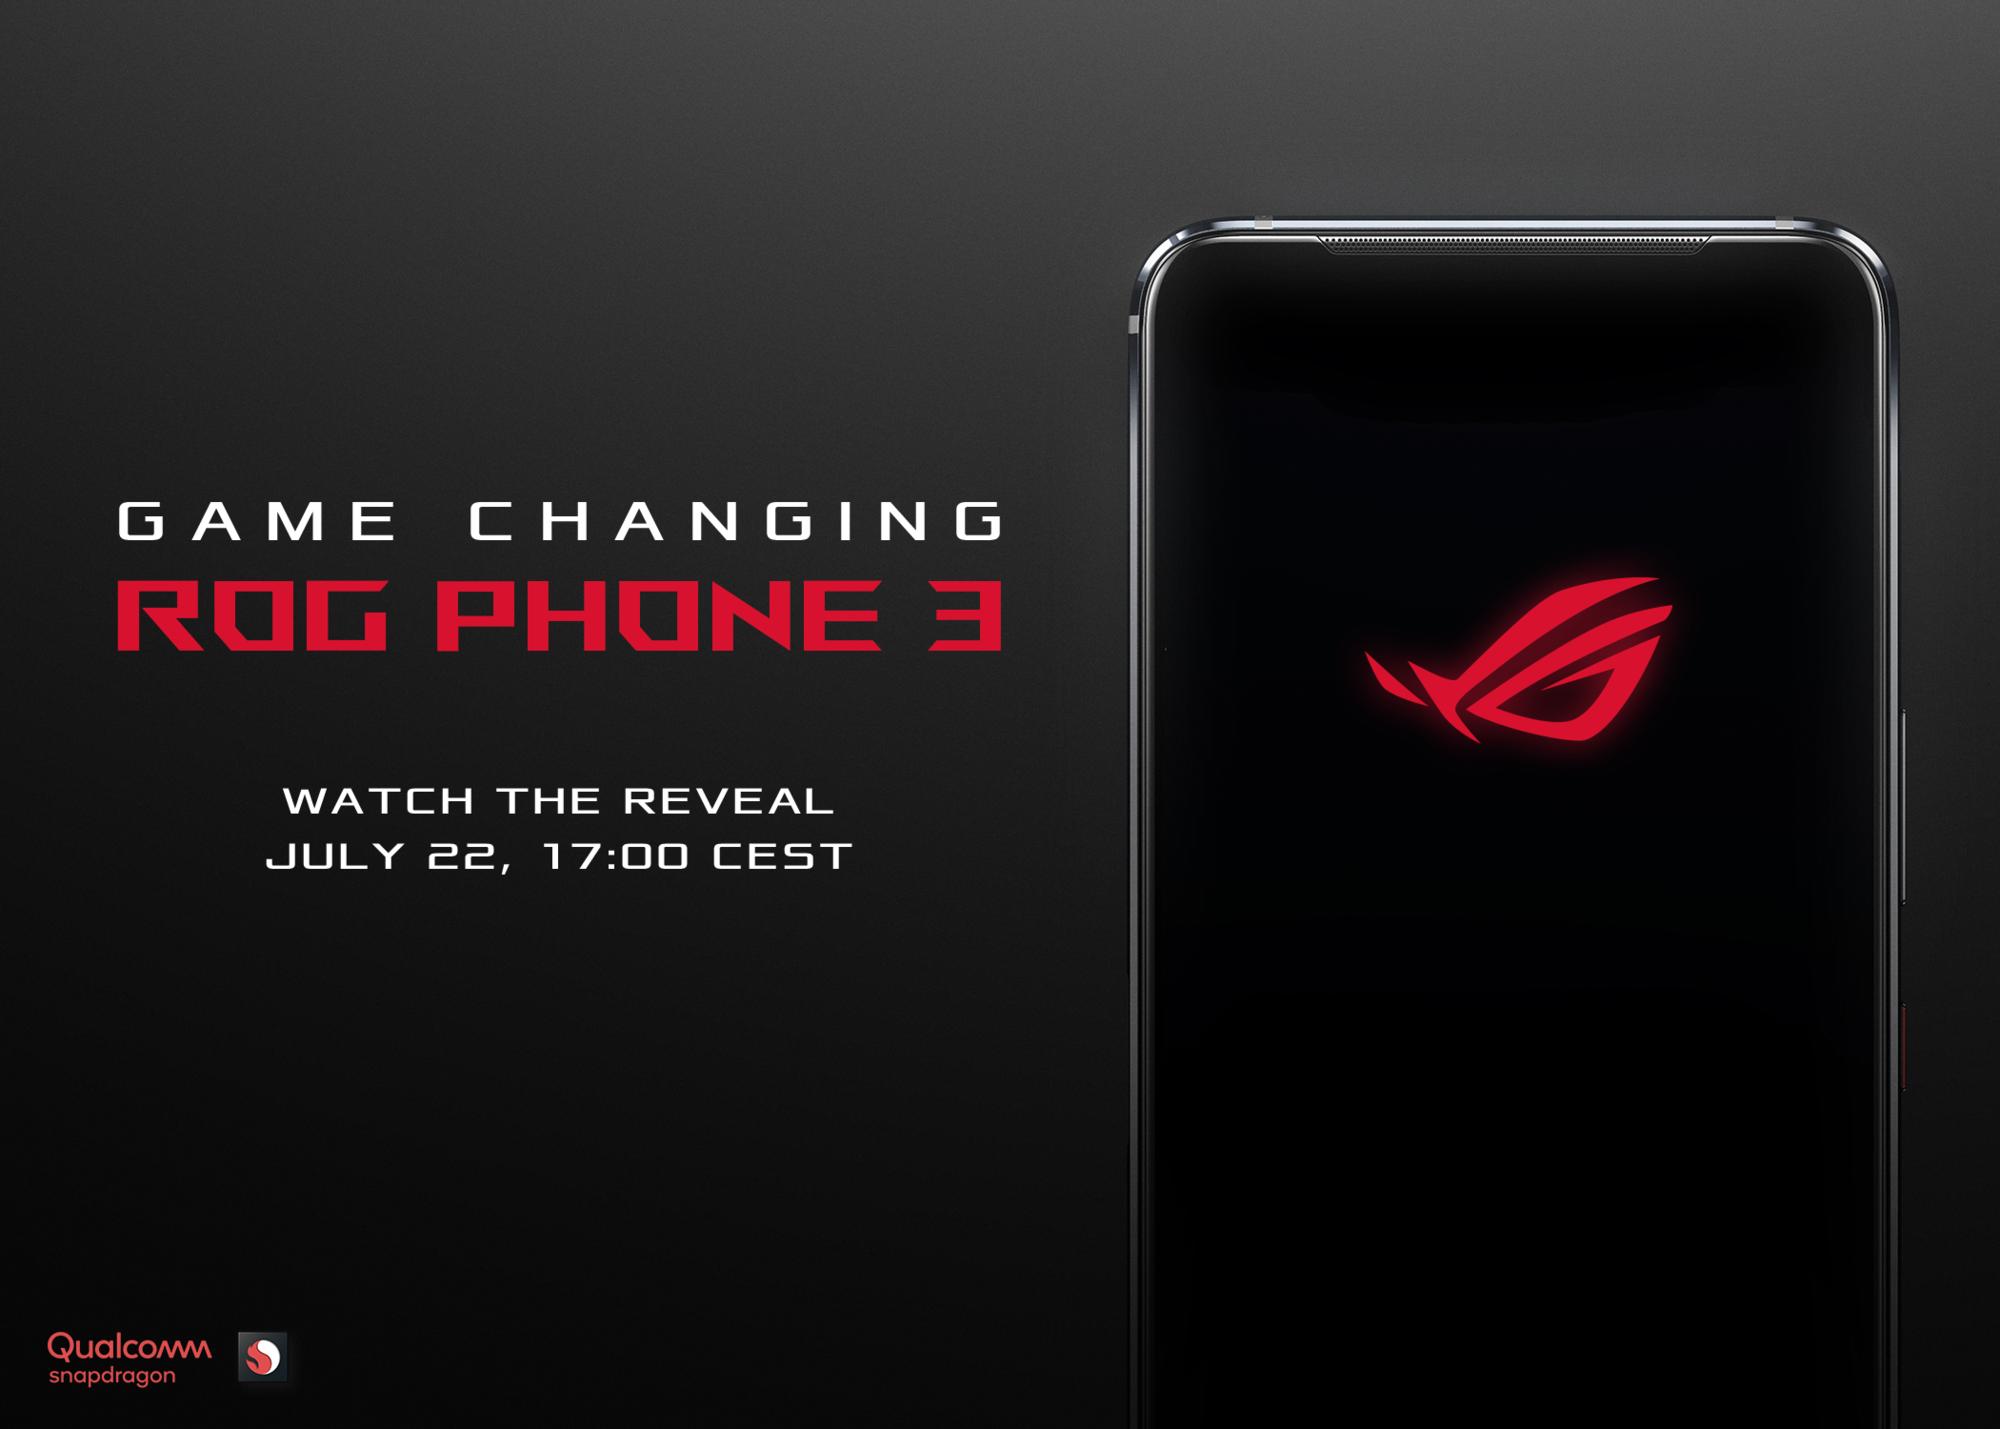 2020-06-15_ROG_Phone_3_Press_release_Teaser_2100x1500_QC_LOGO.jpg.png